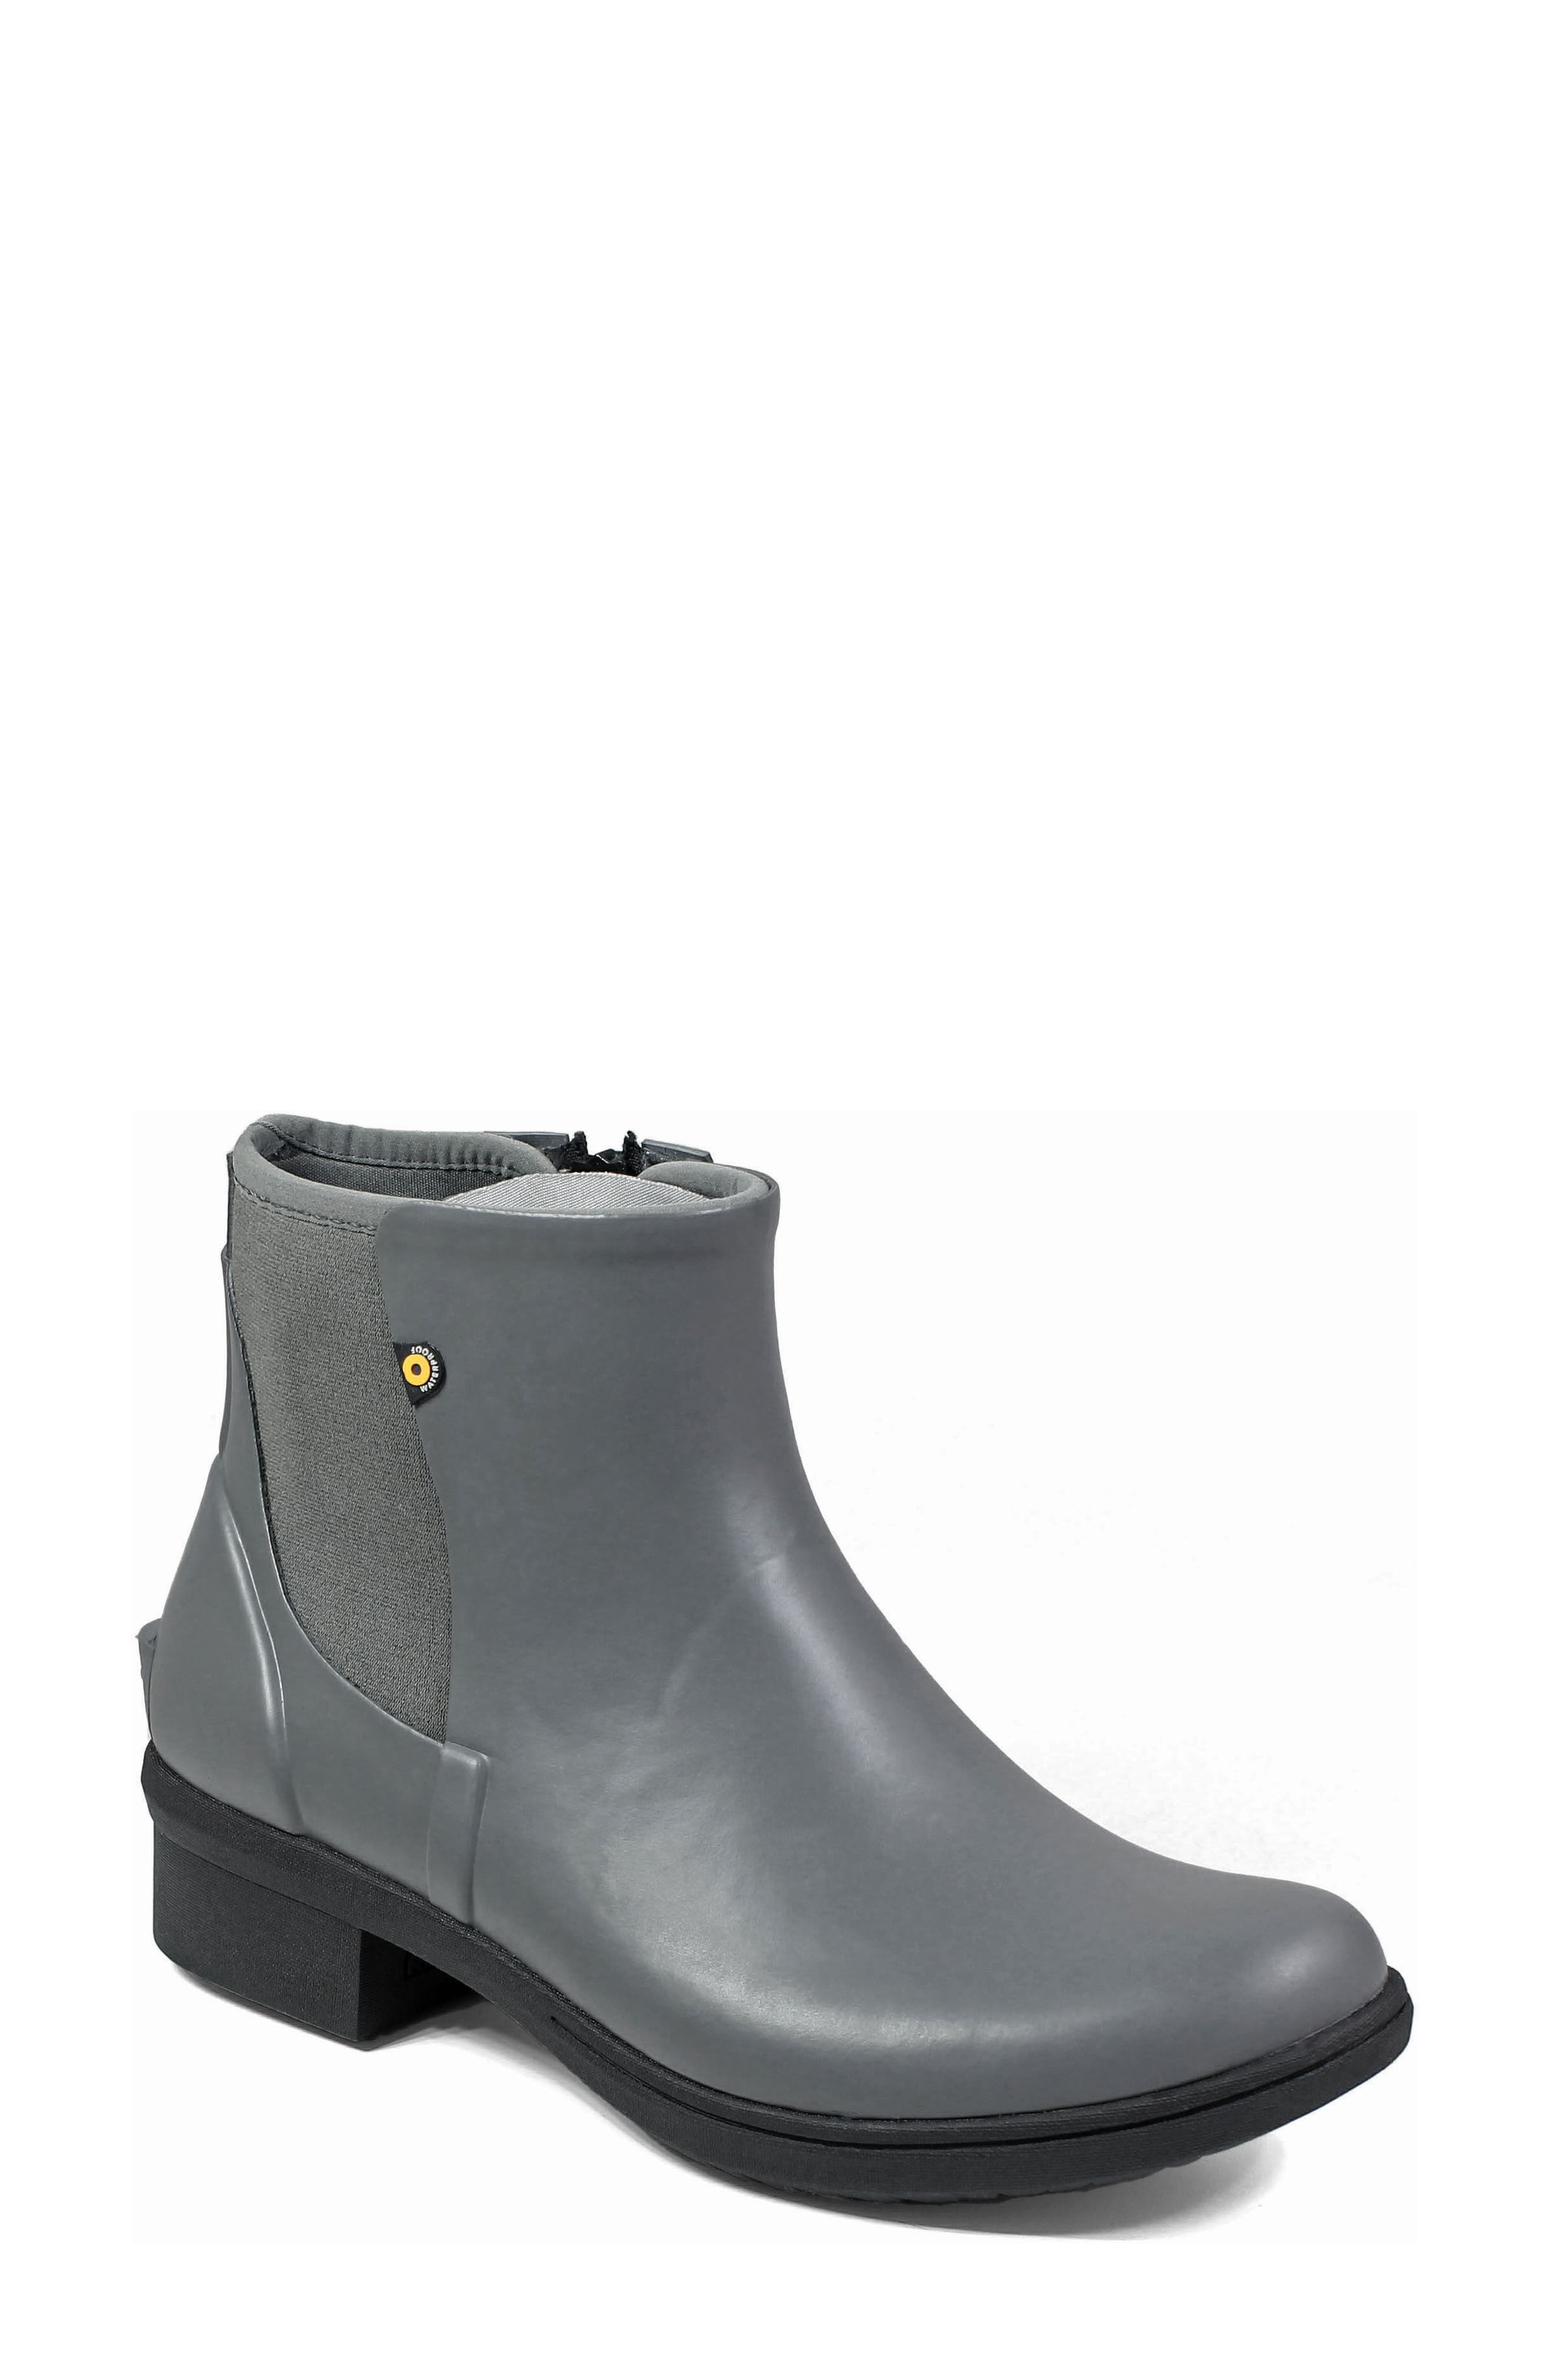 Auburn Insulated Waterproof Boot,                         Main,                         color, Grey